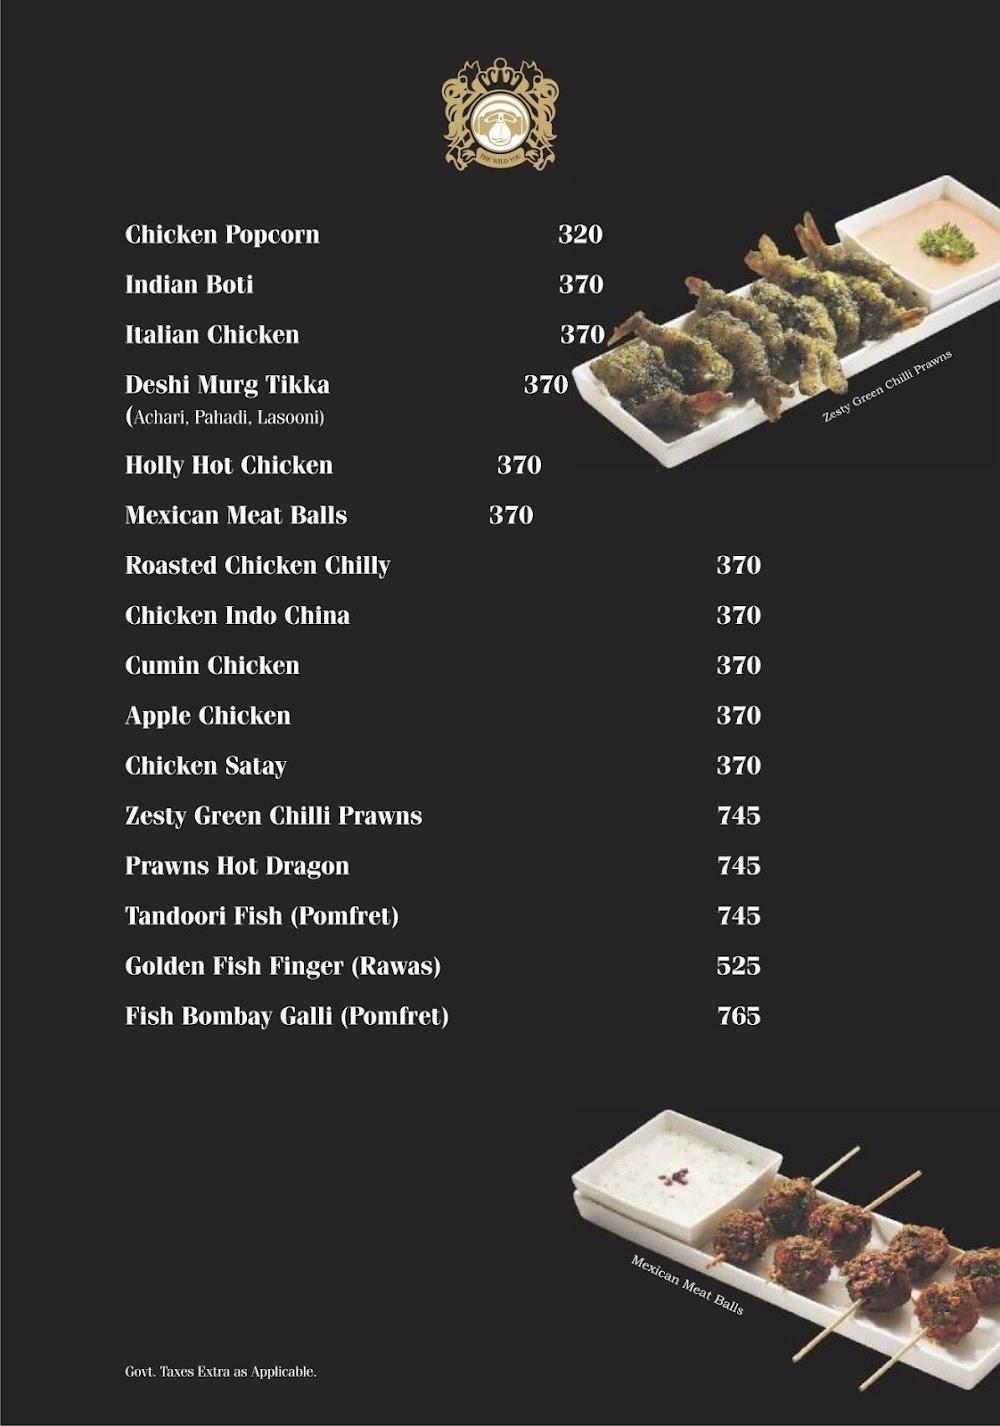 Brass Monkey menu 1